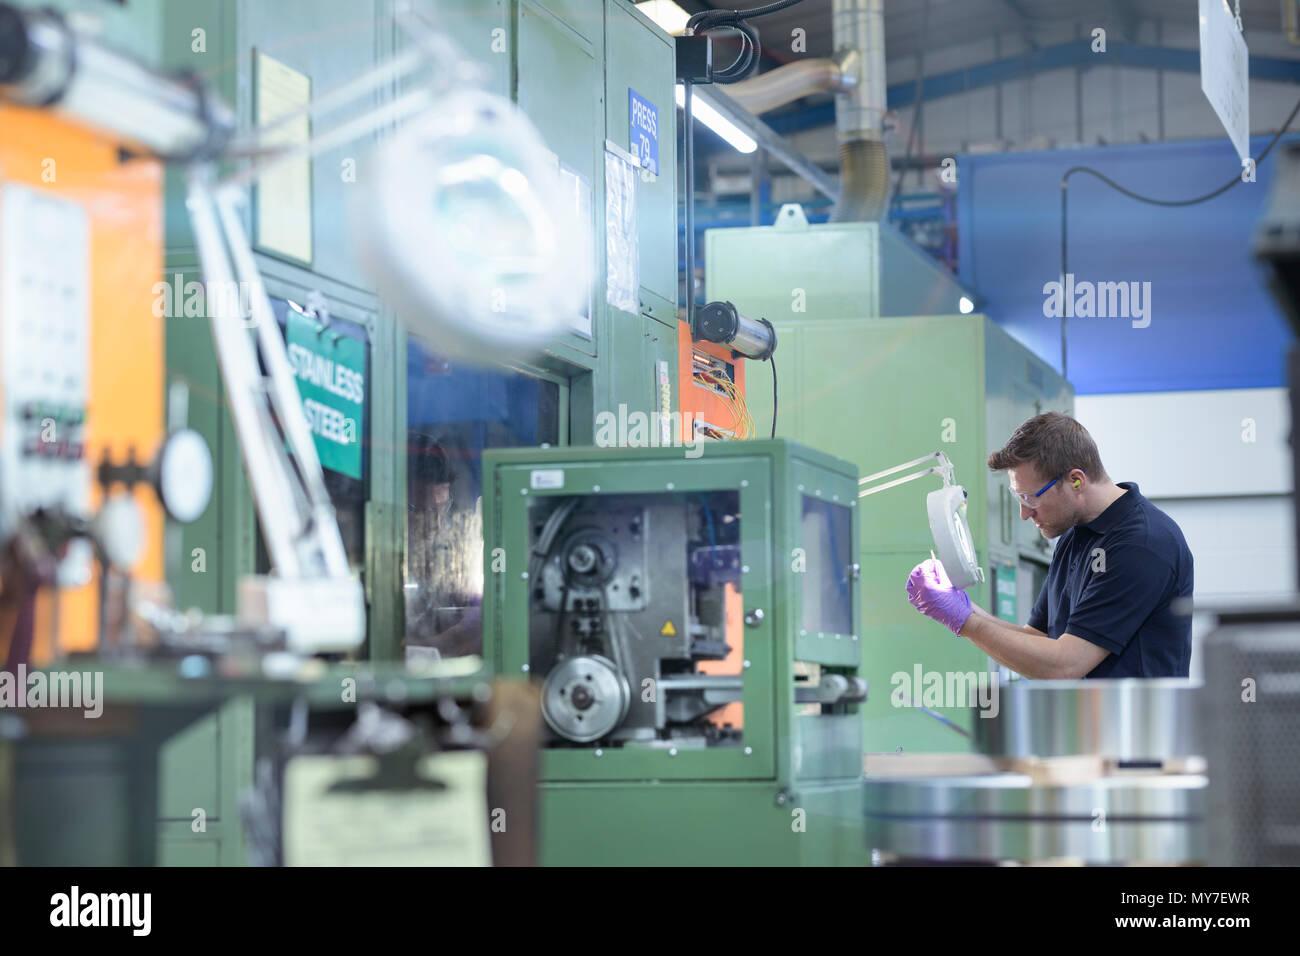 Engineer inspecting pressed metal part in metal pressing factory - Stock Image